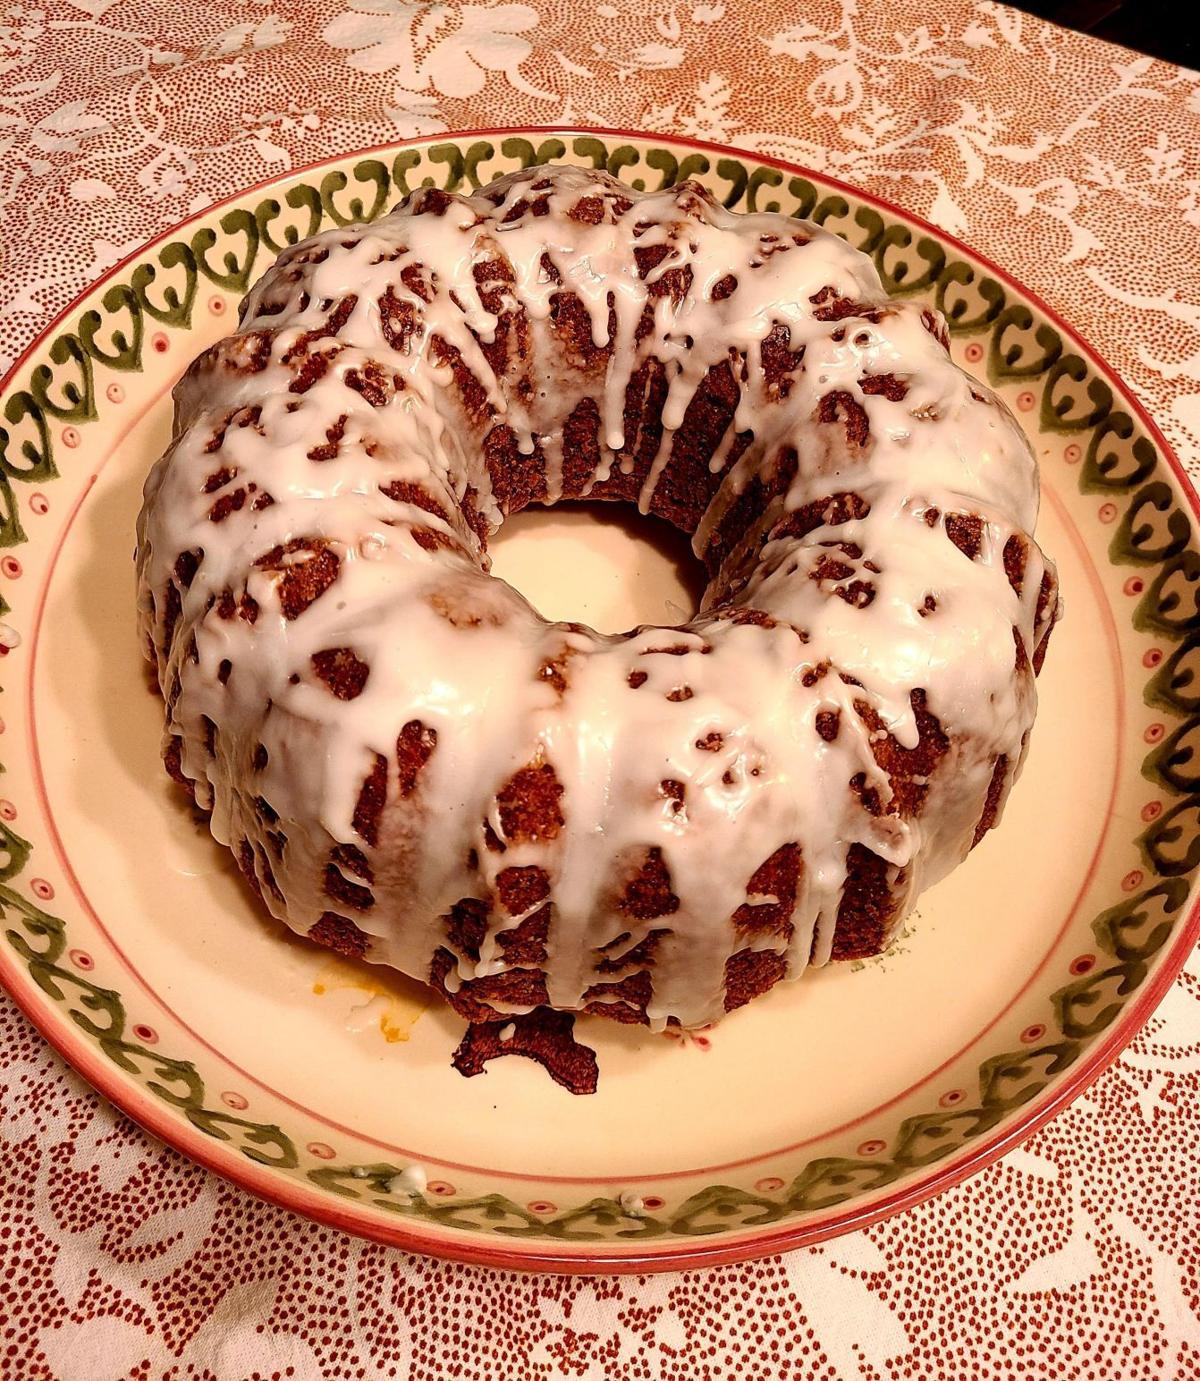 Carrot-Poppy Seed Bundt Cake with Lemon Glaze